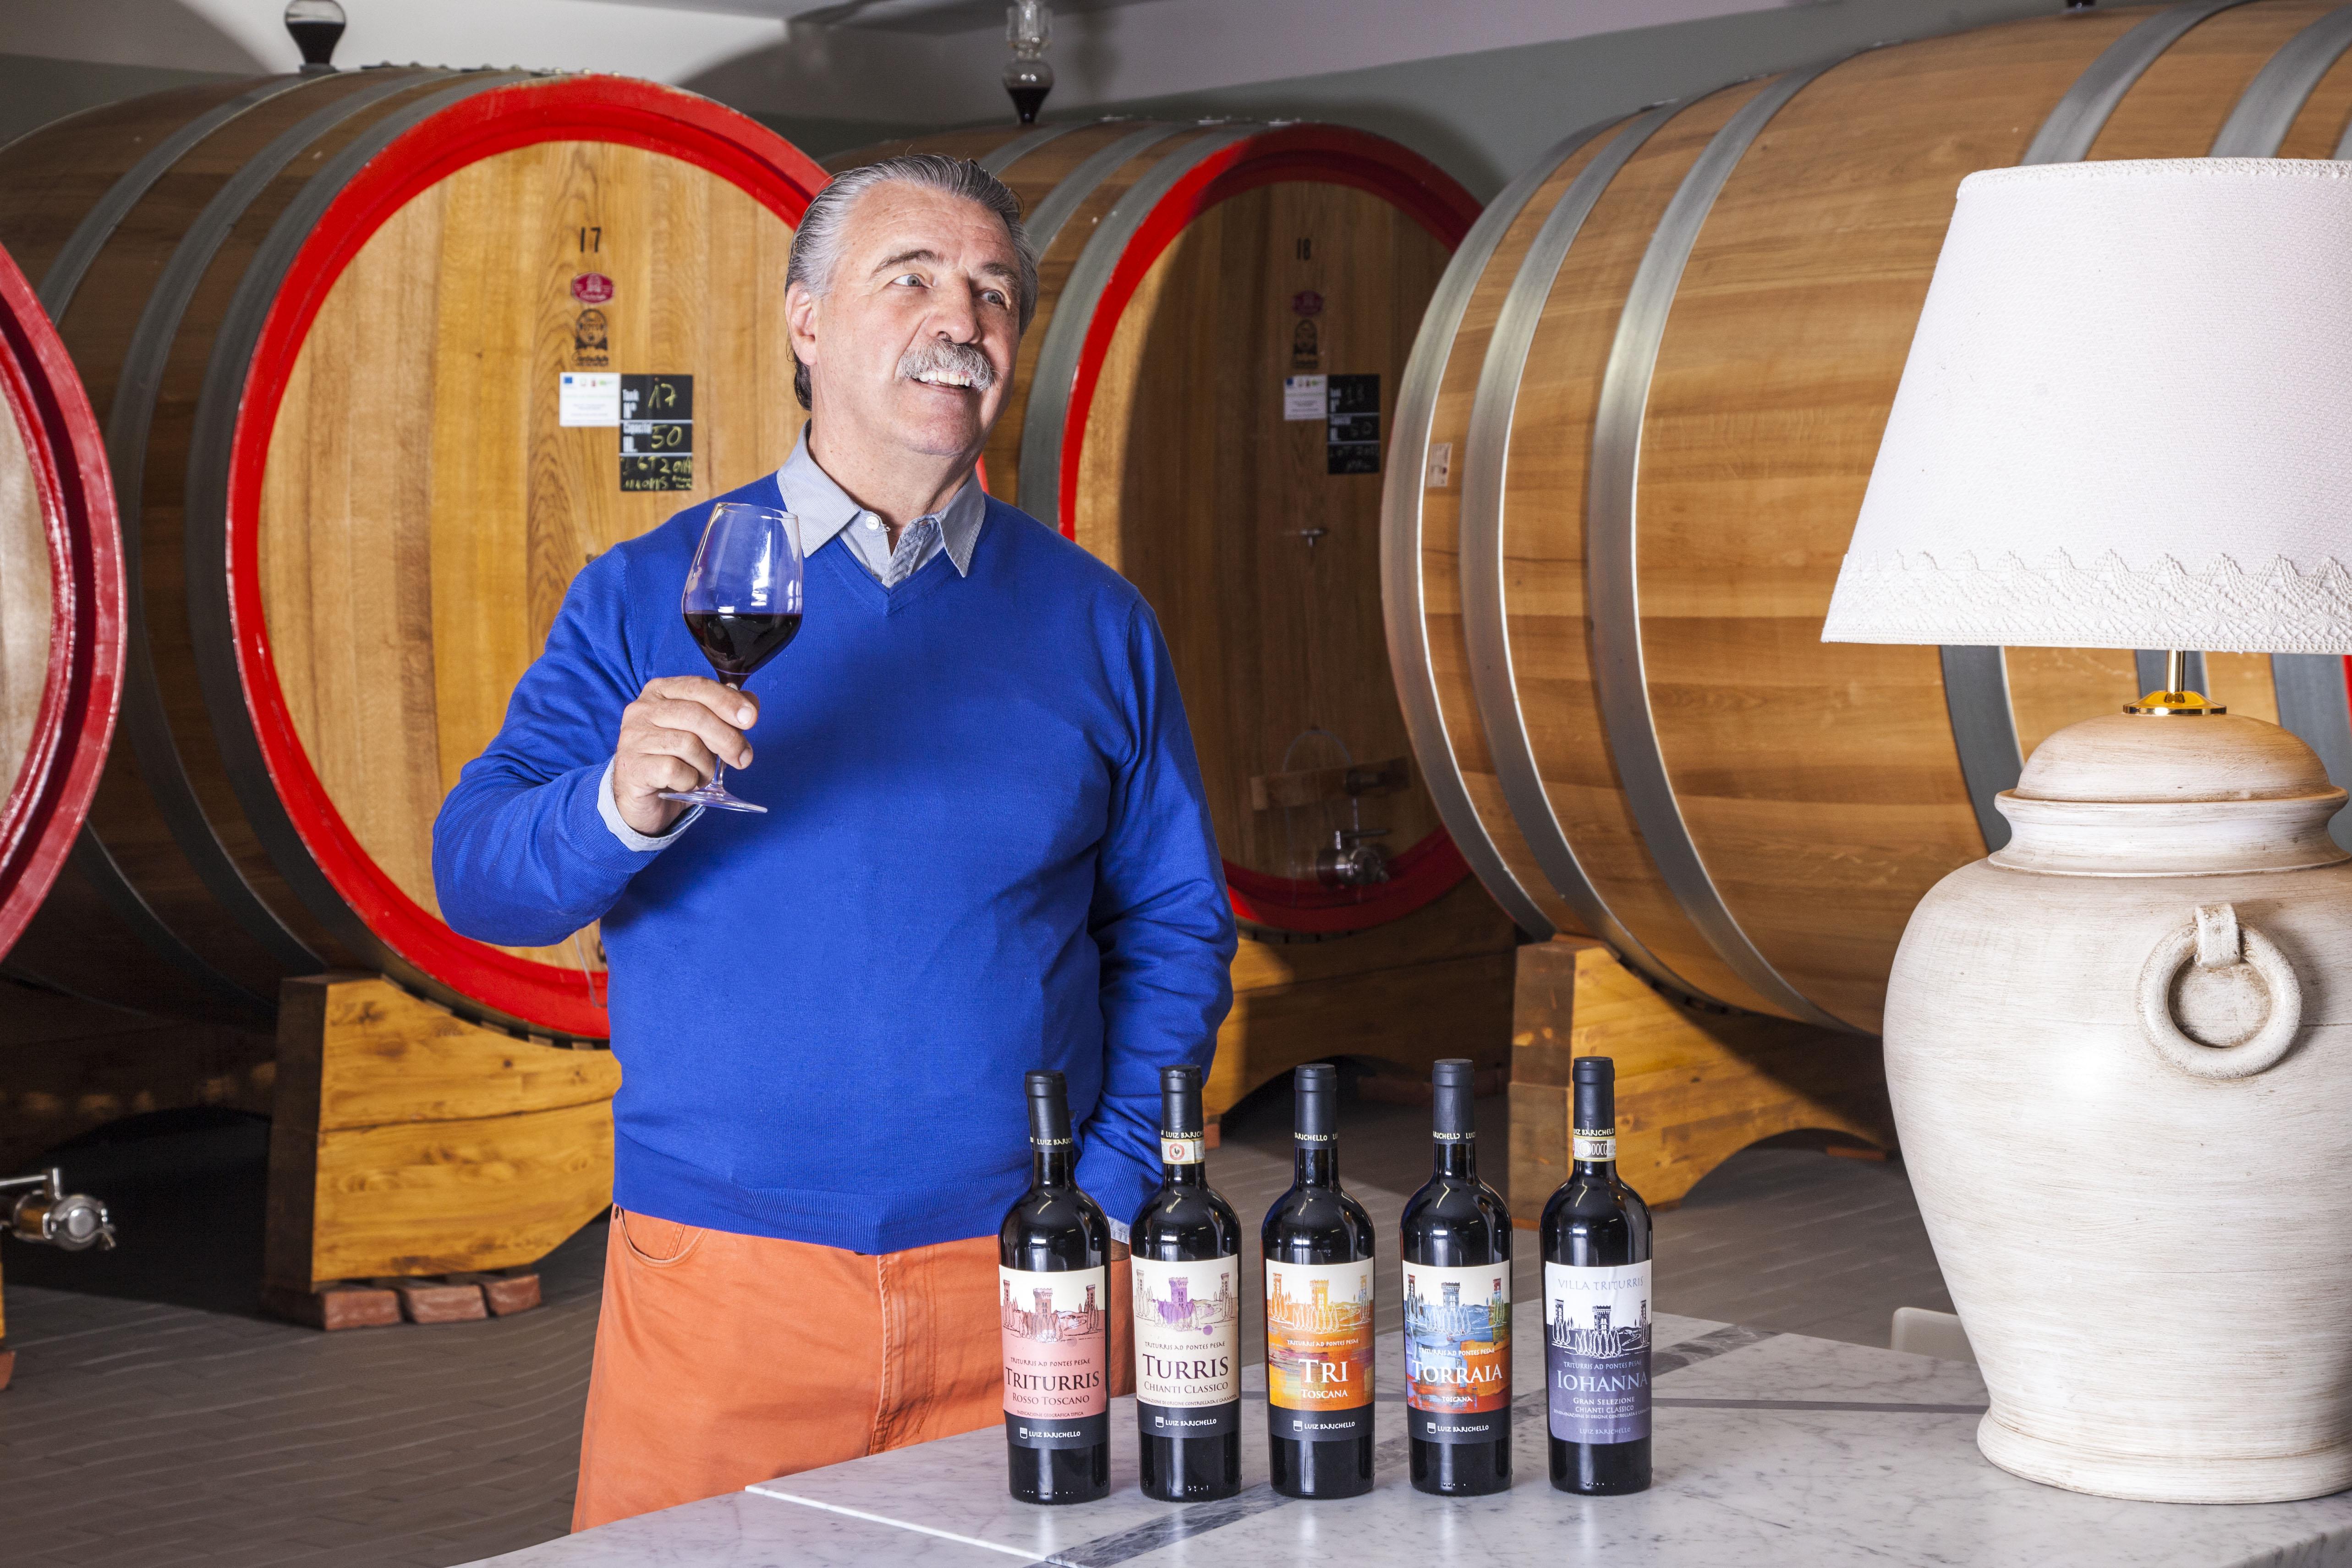 Luiz Barichello Villa Triturris tasting